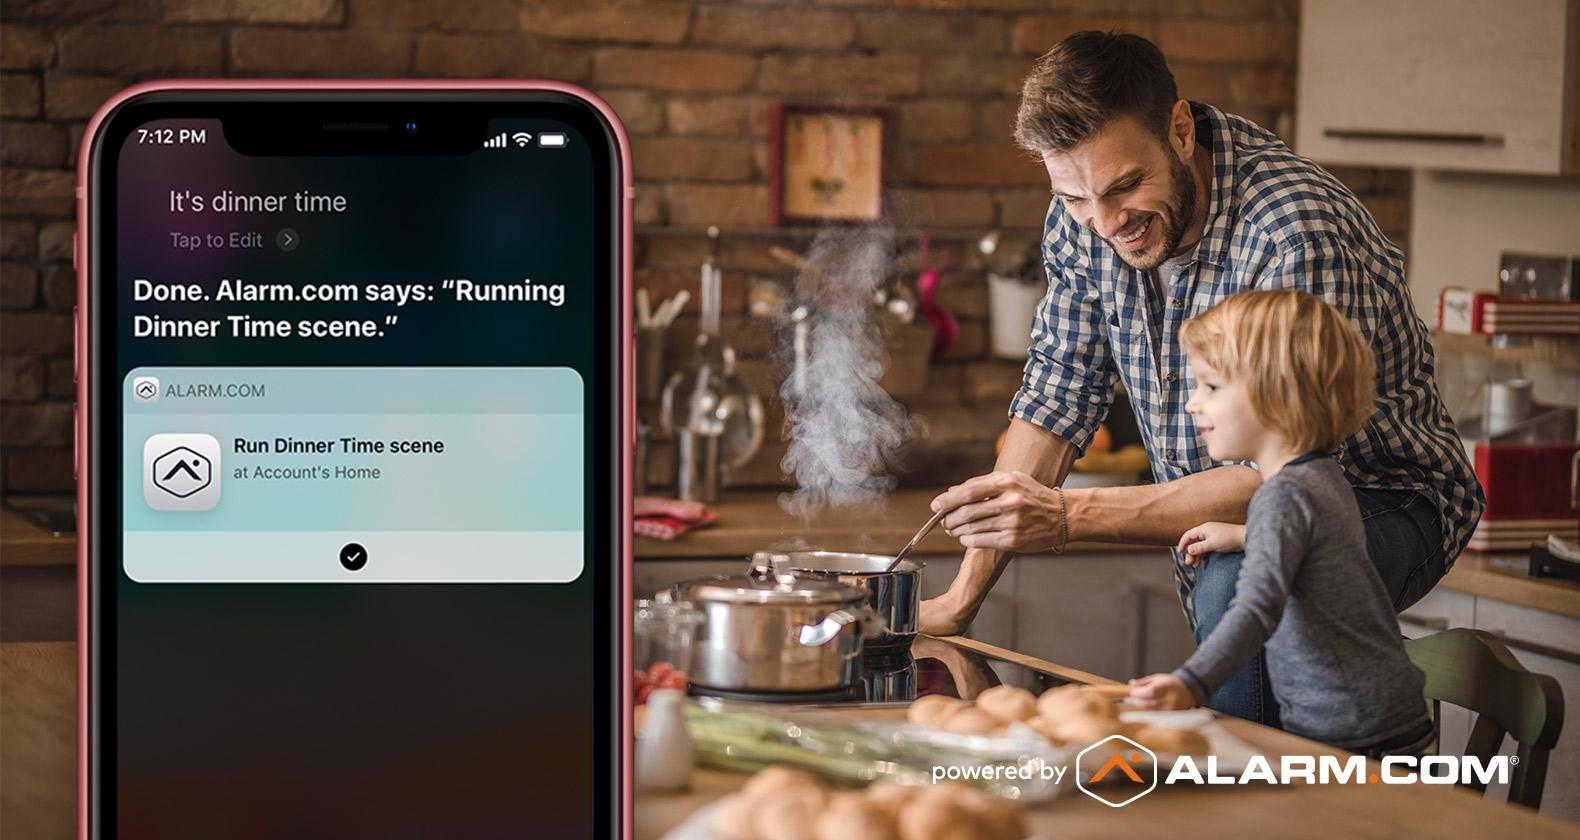 Siri Shortcut Alarm.com Dinnertime